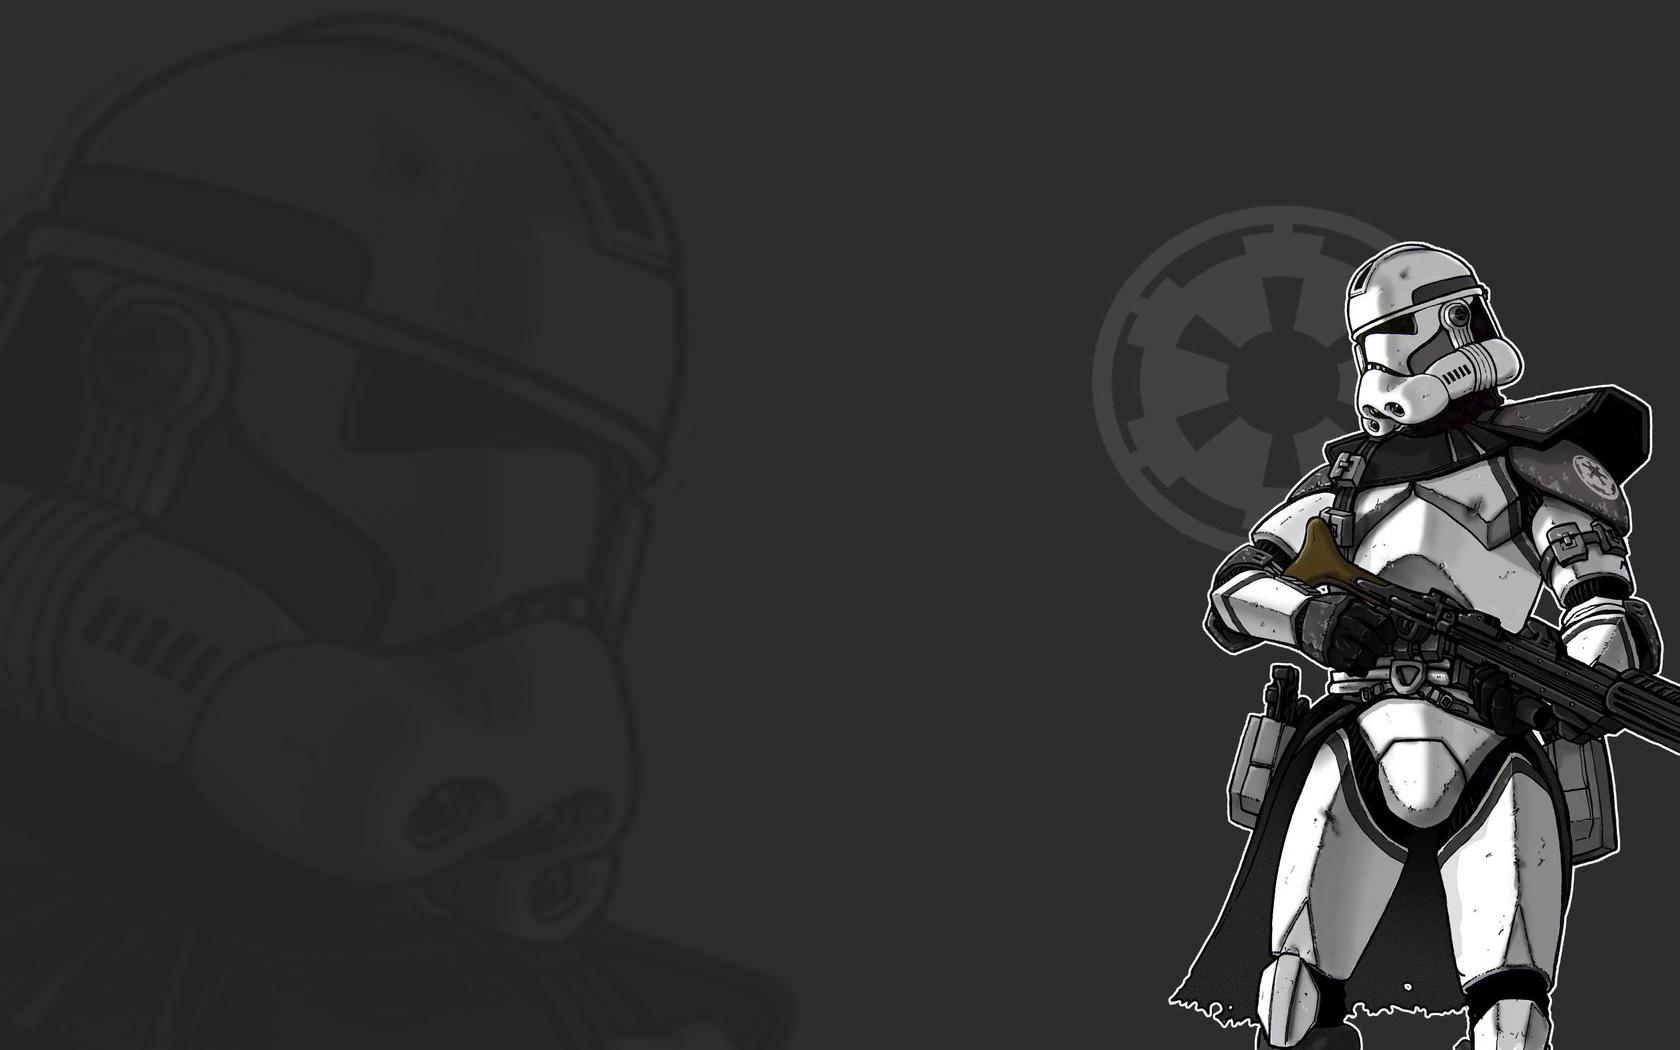 4437_star_wars_jedi_light_saber